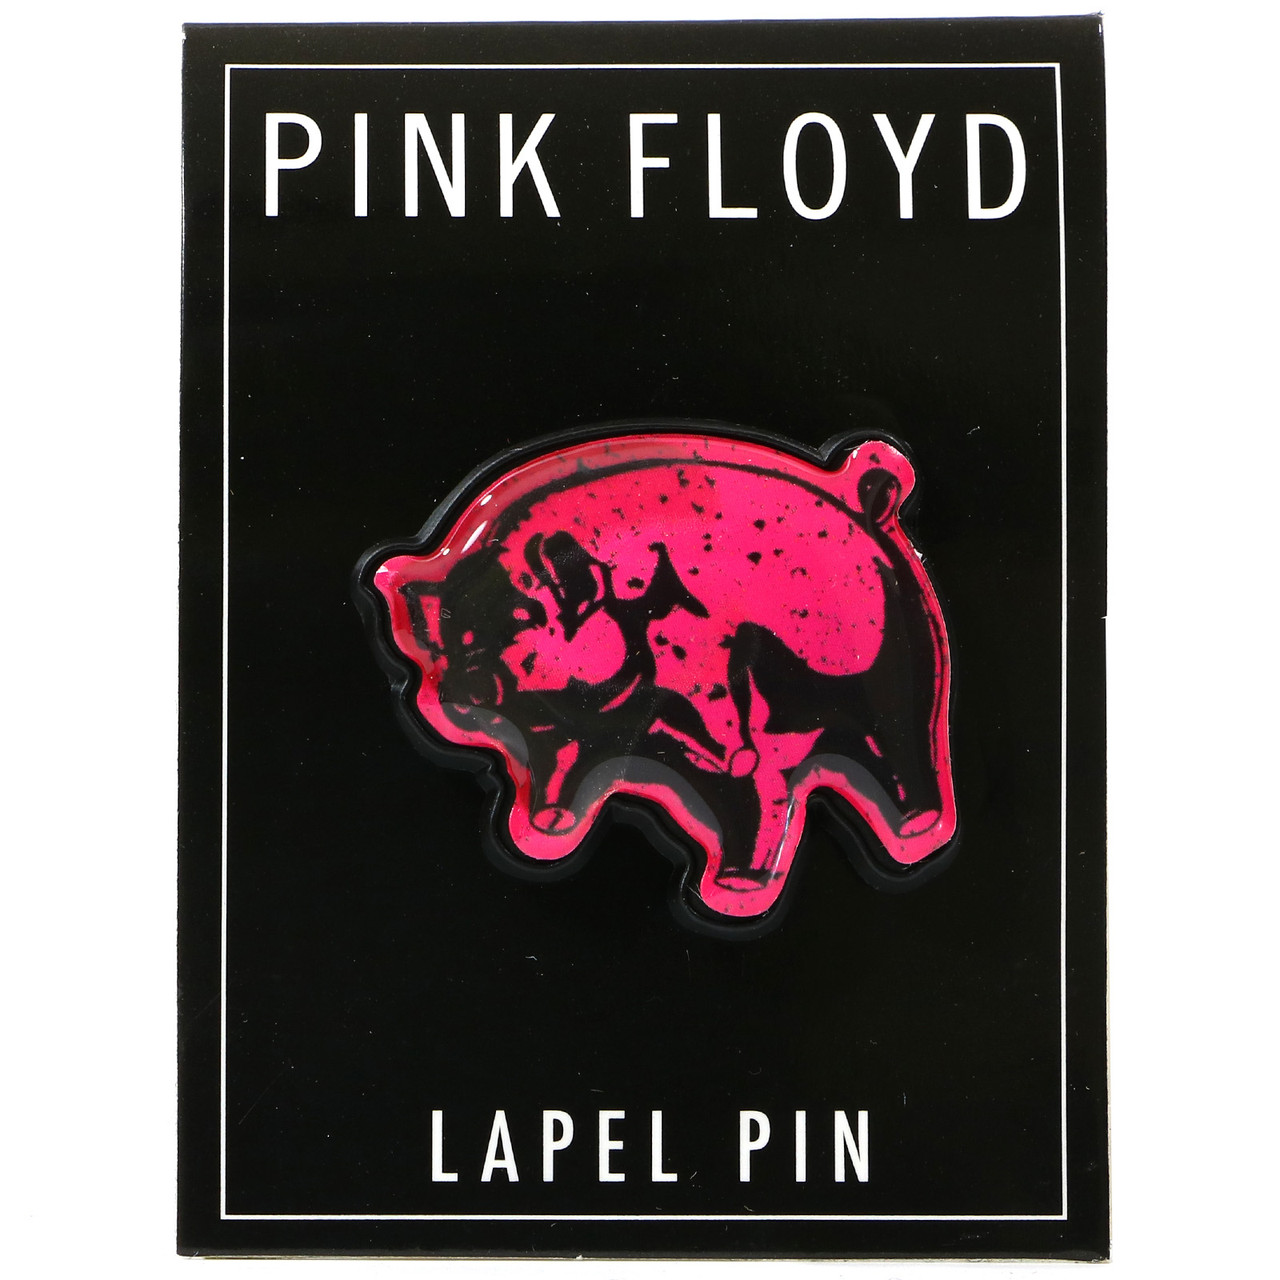 Pink Floyd Floating Pig Lapel Pin